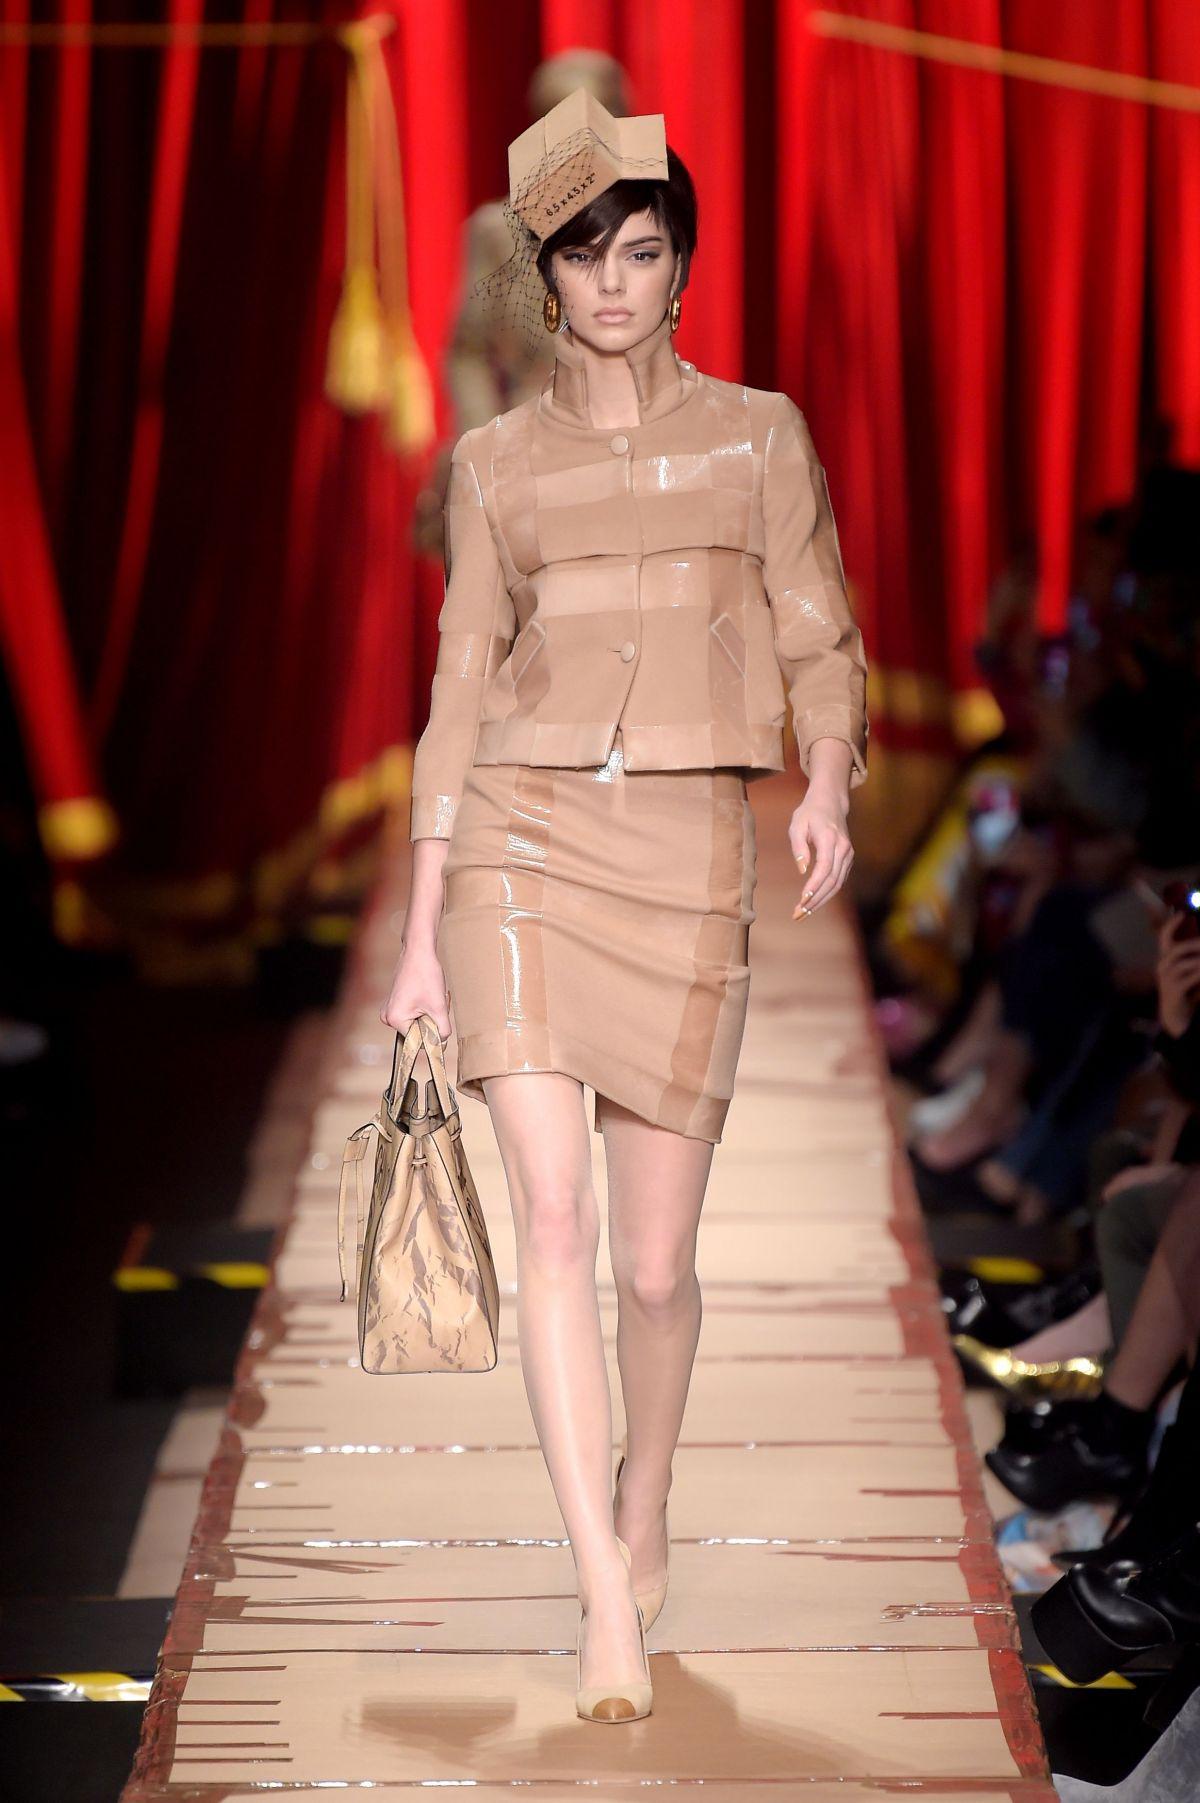 Kendall Jenner At Moschino Fashion Show At Milan Fashion